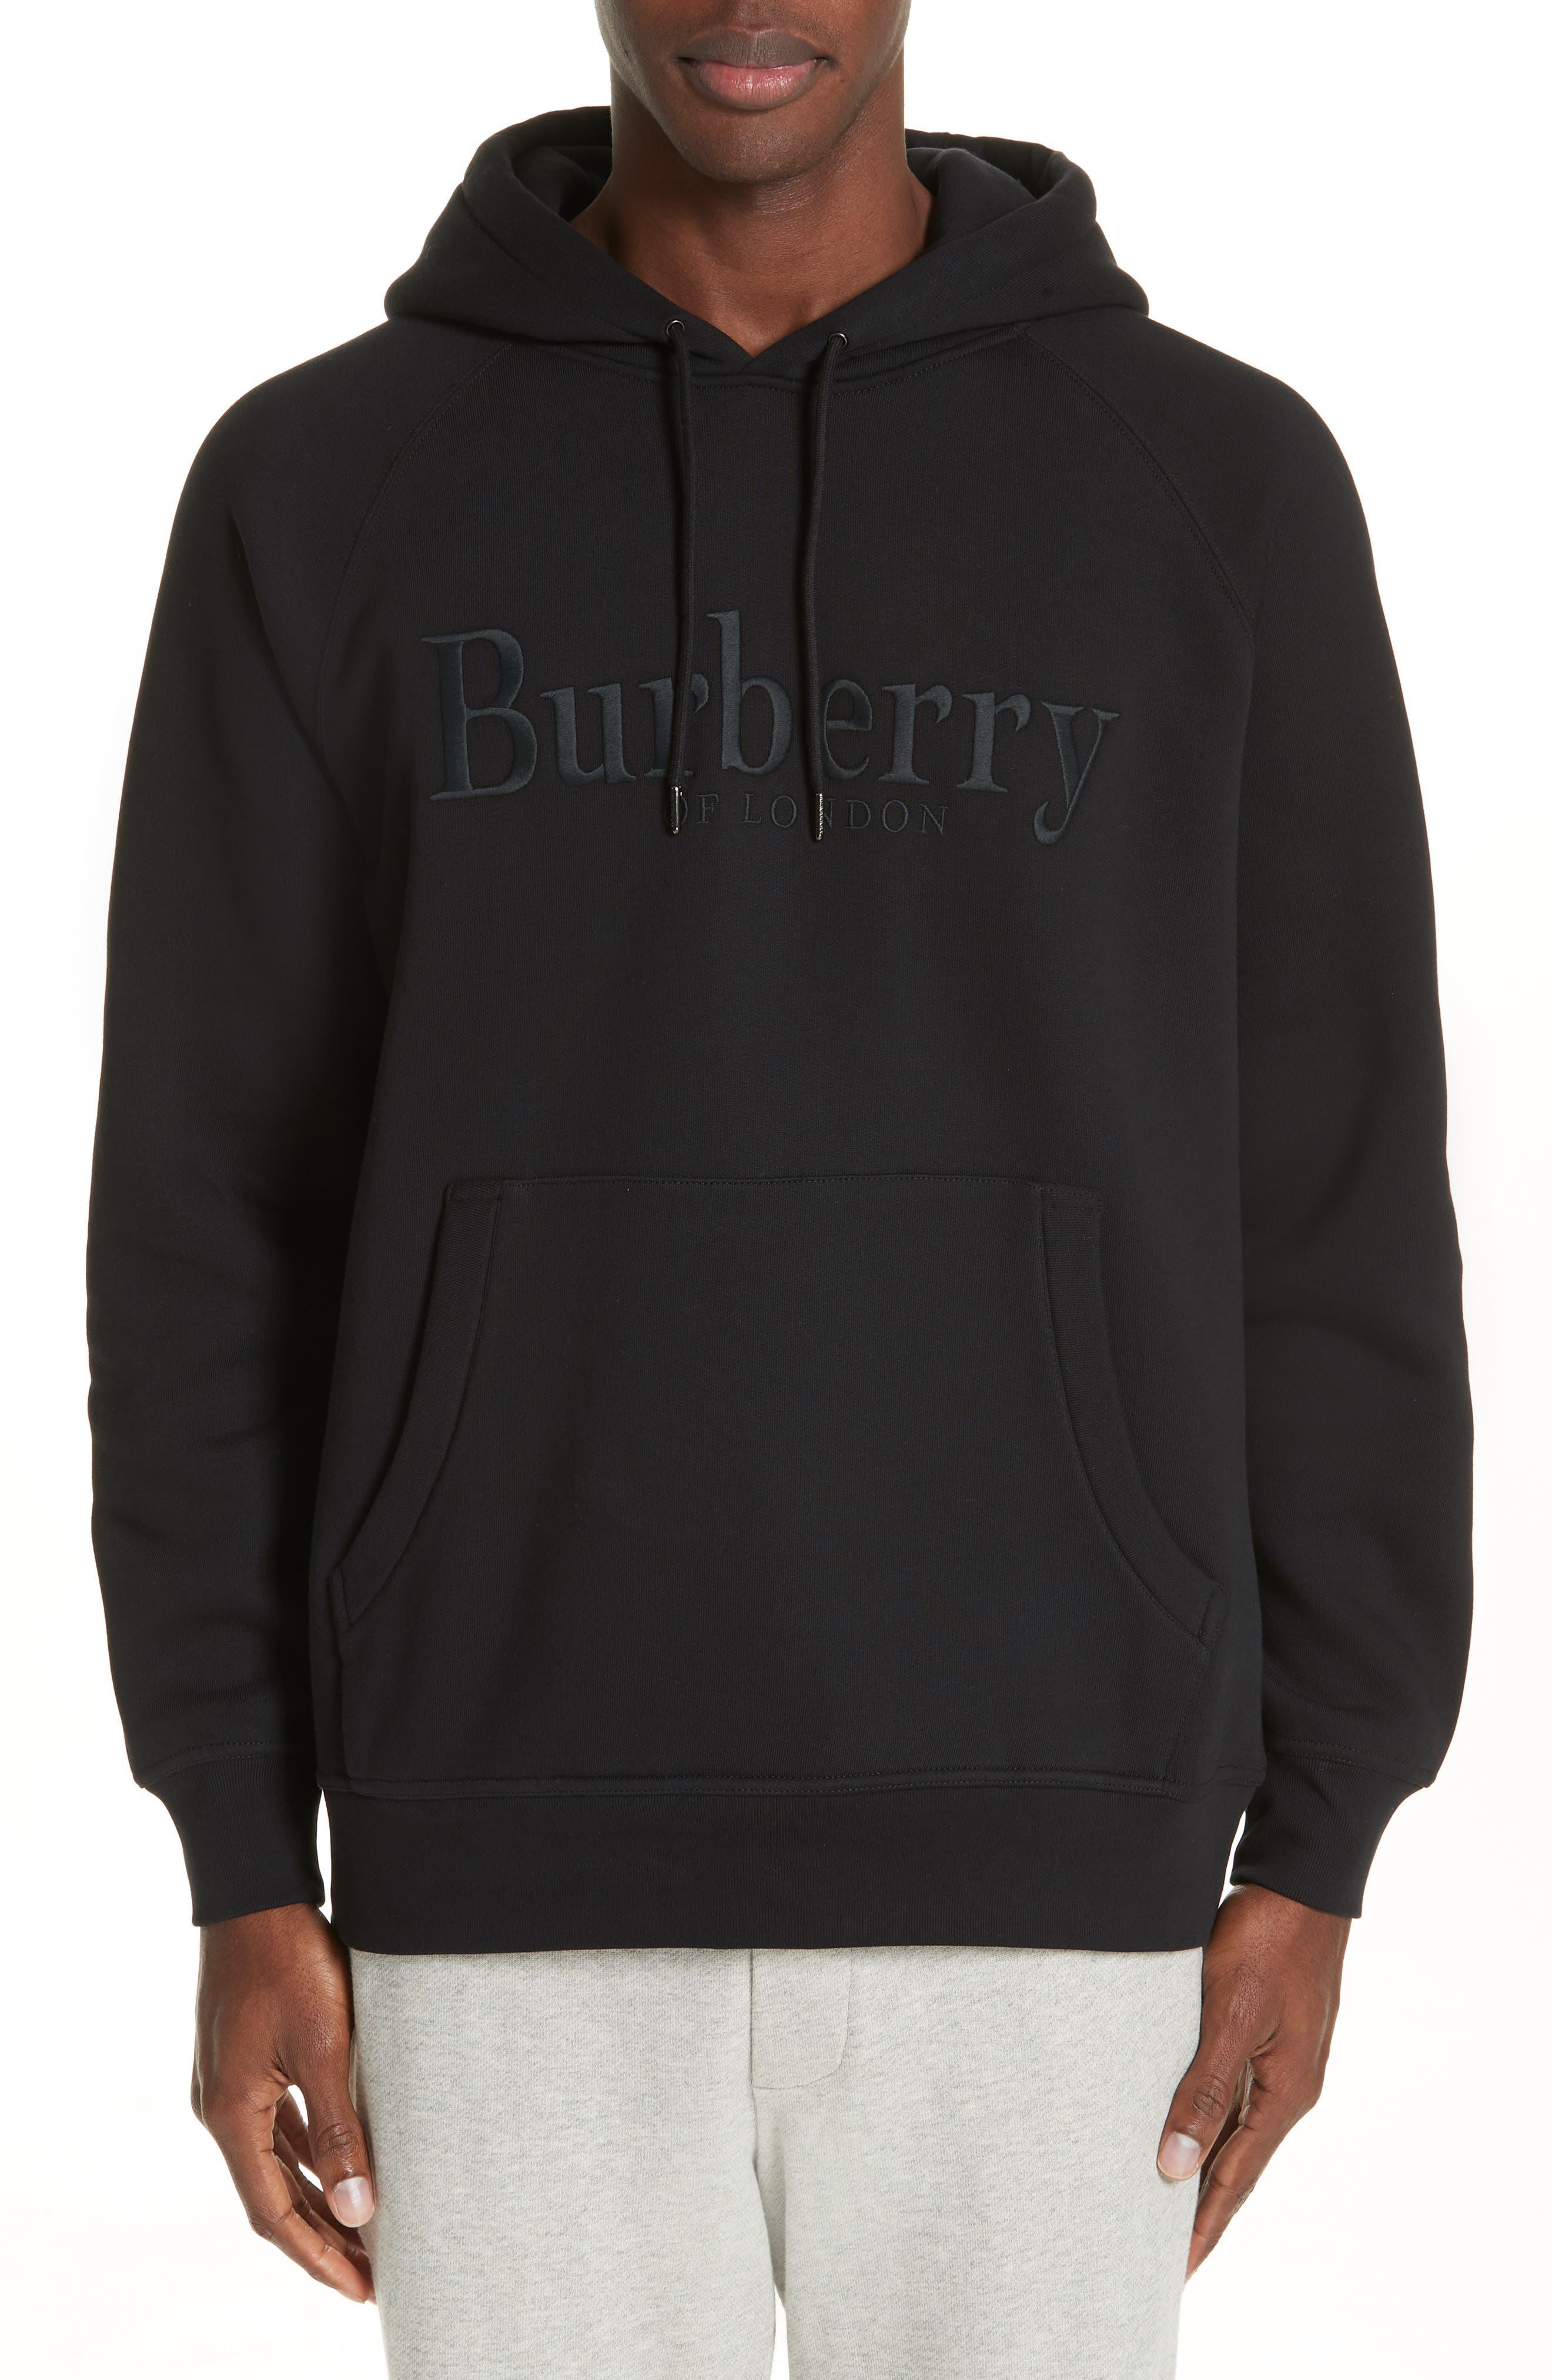 BURBERRY, Clarke Logo Hoodie, Main thumbnail 1, color, BLACK